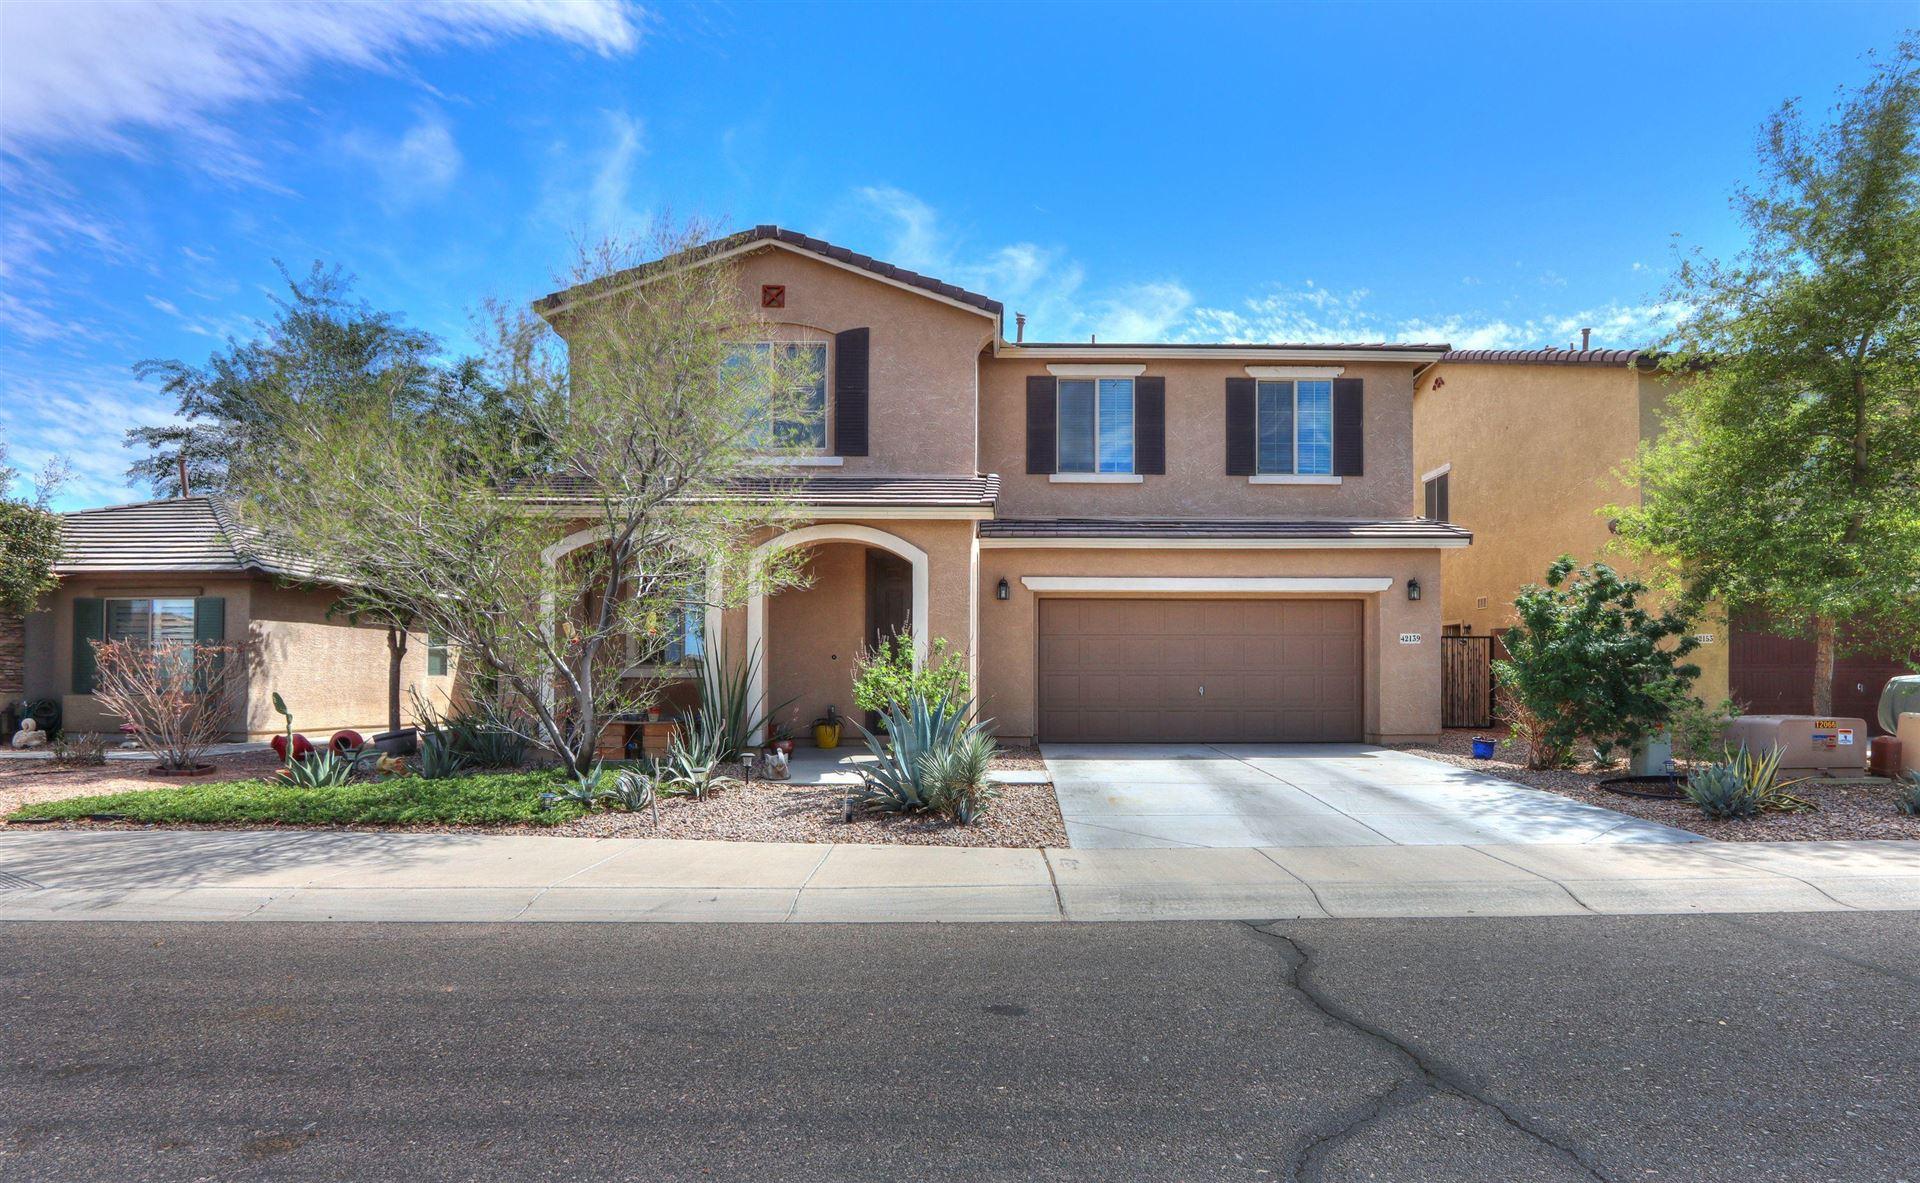 Photo of 42139 W CHEYENNE Drive, Maricopa, AZ 85138 (MLS # 6217147)